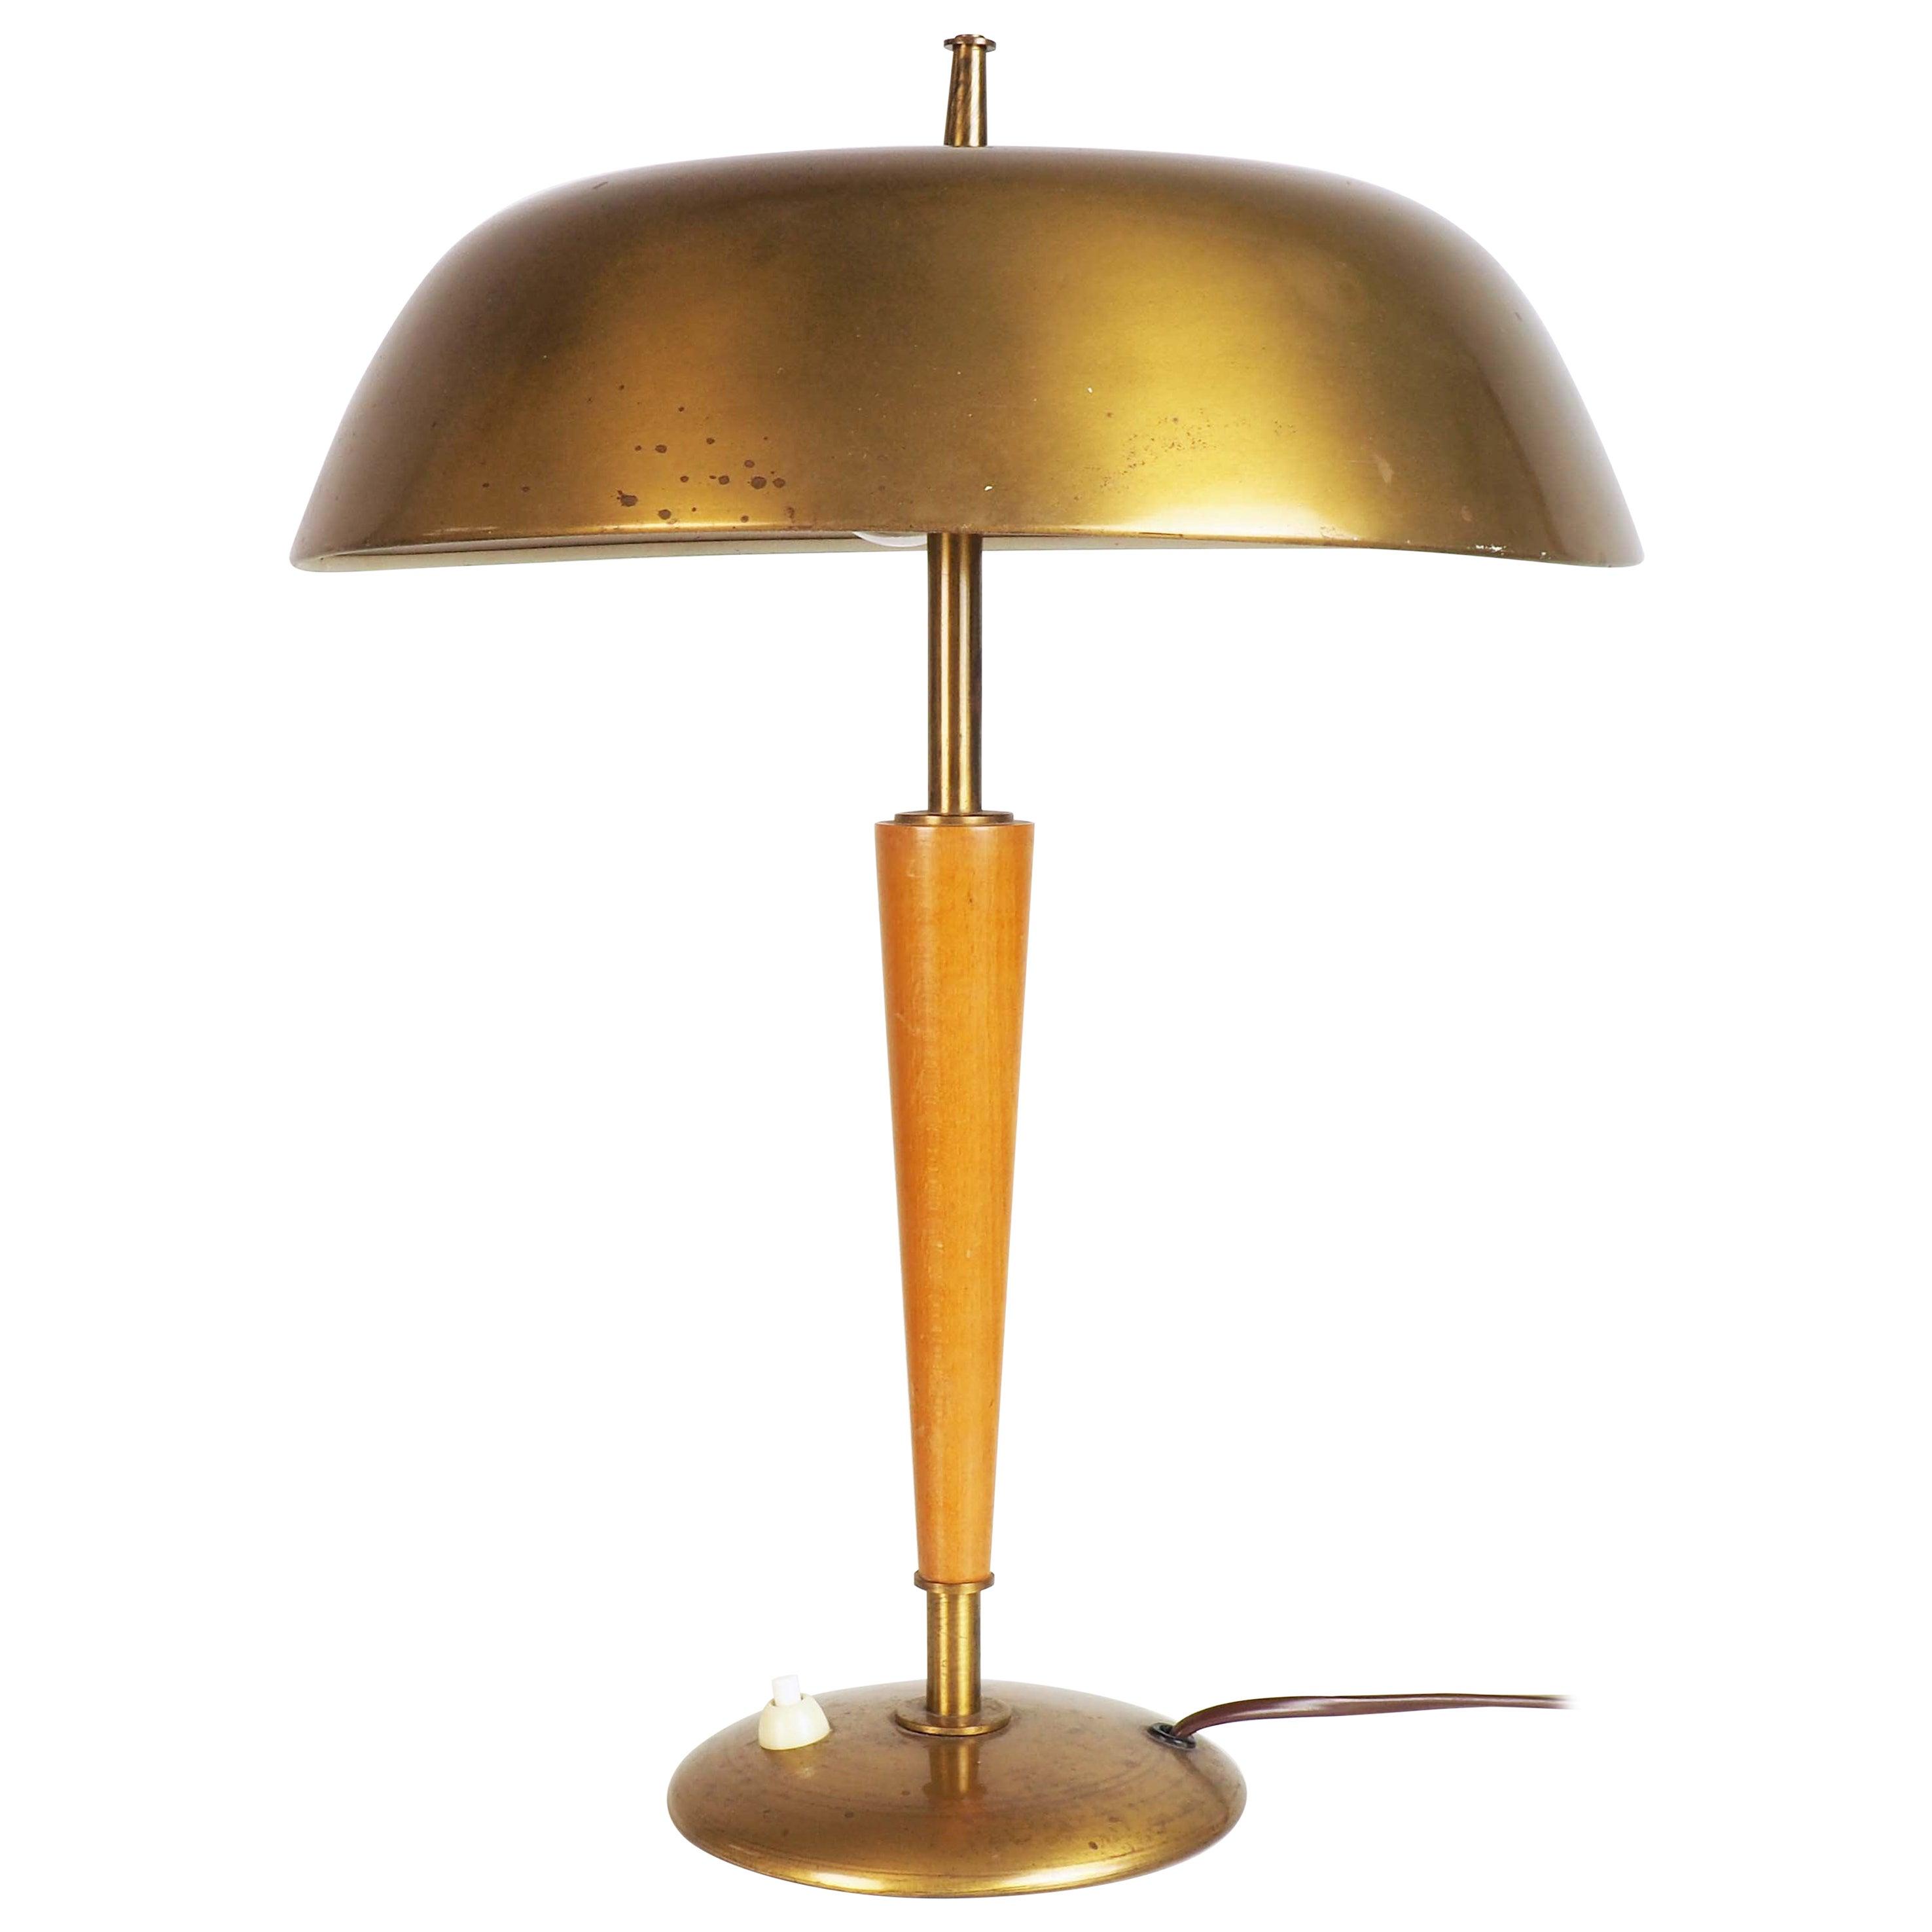 Table Lamp in Elm and Brass from Nordiska Kompaniet, Stockholm, Sweden, 1940s